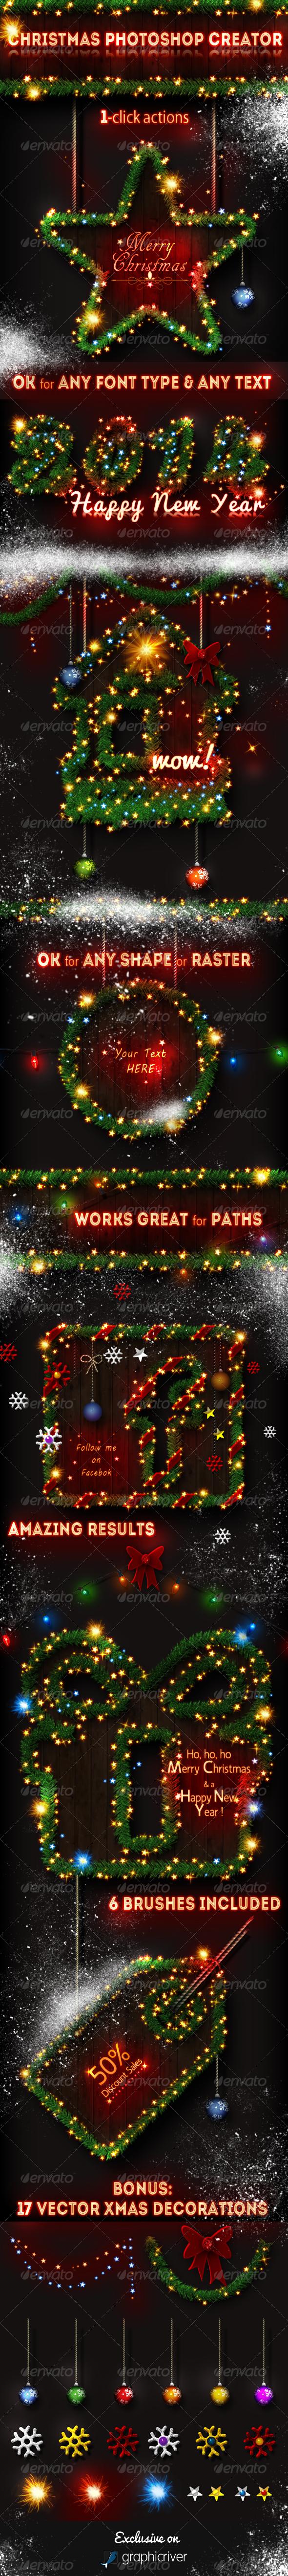 GraphicRiver Christmas Tree Photoshop Creator 6066044